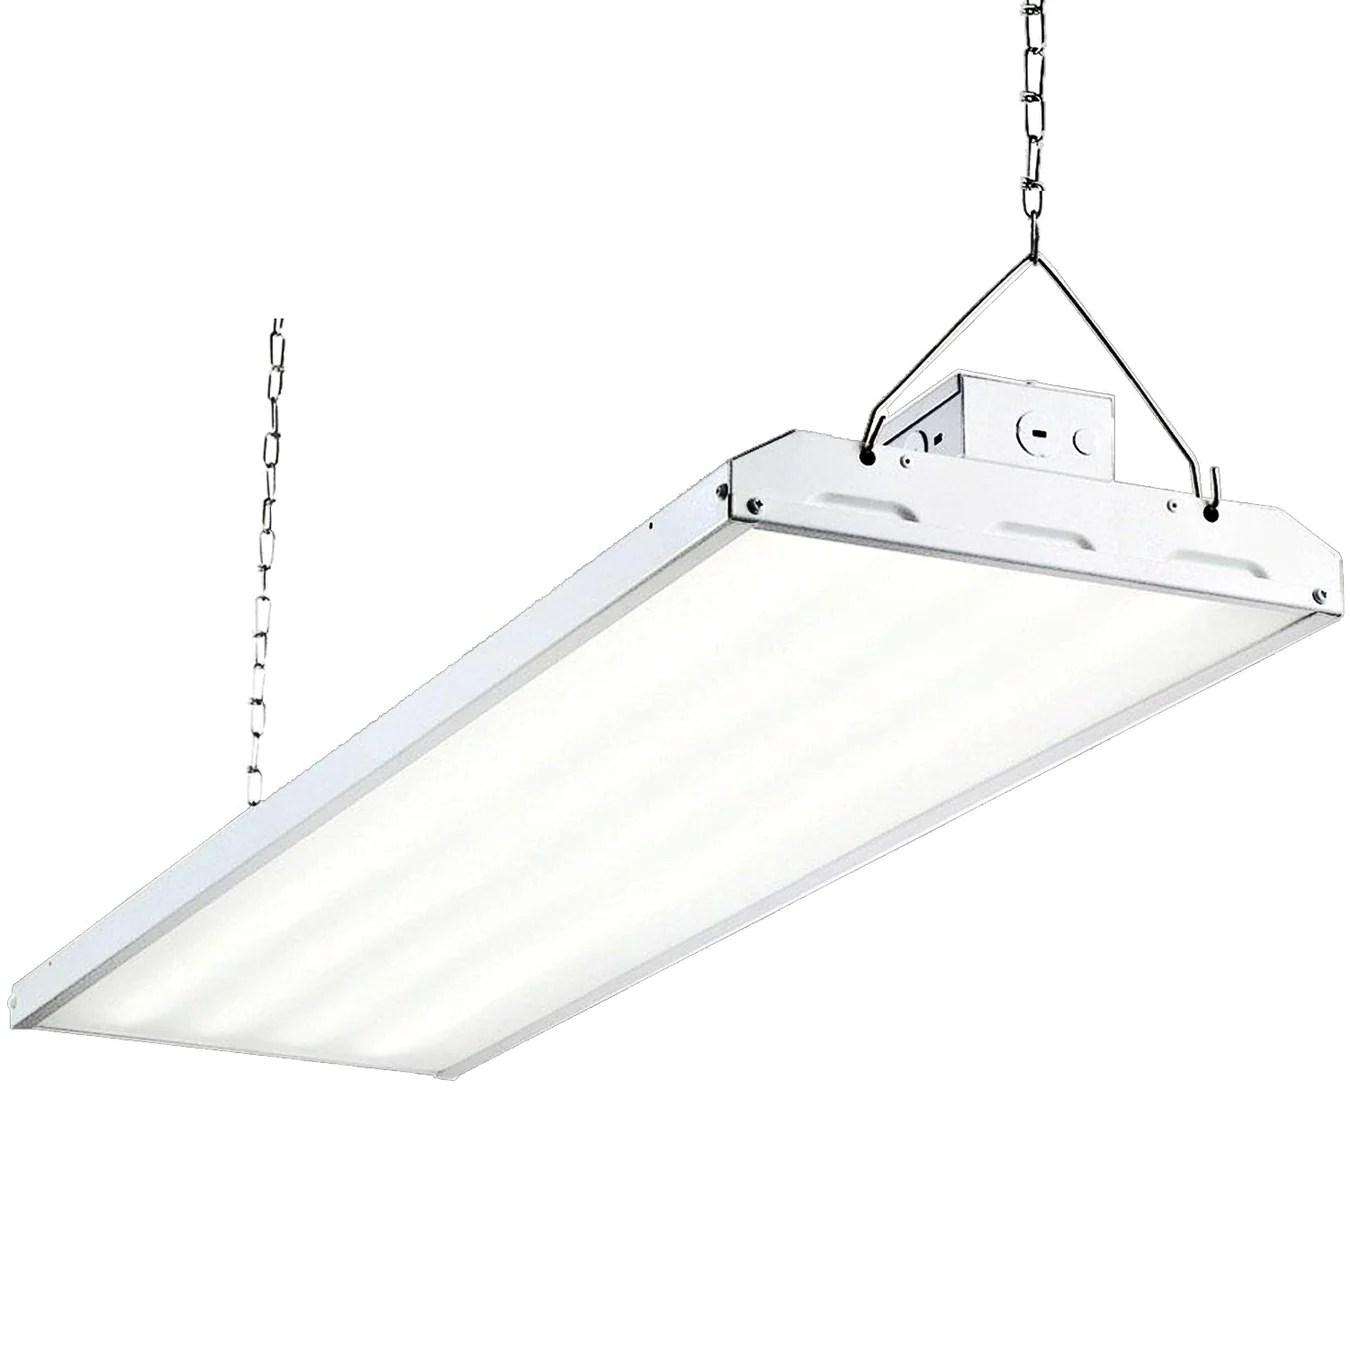 hight resolution of led linear high bay light